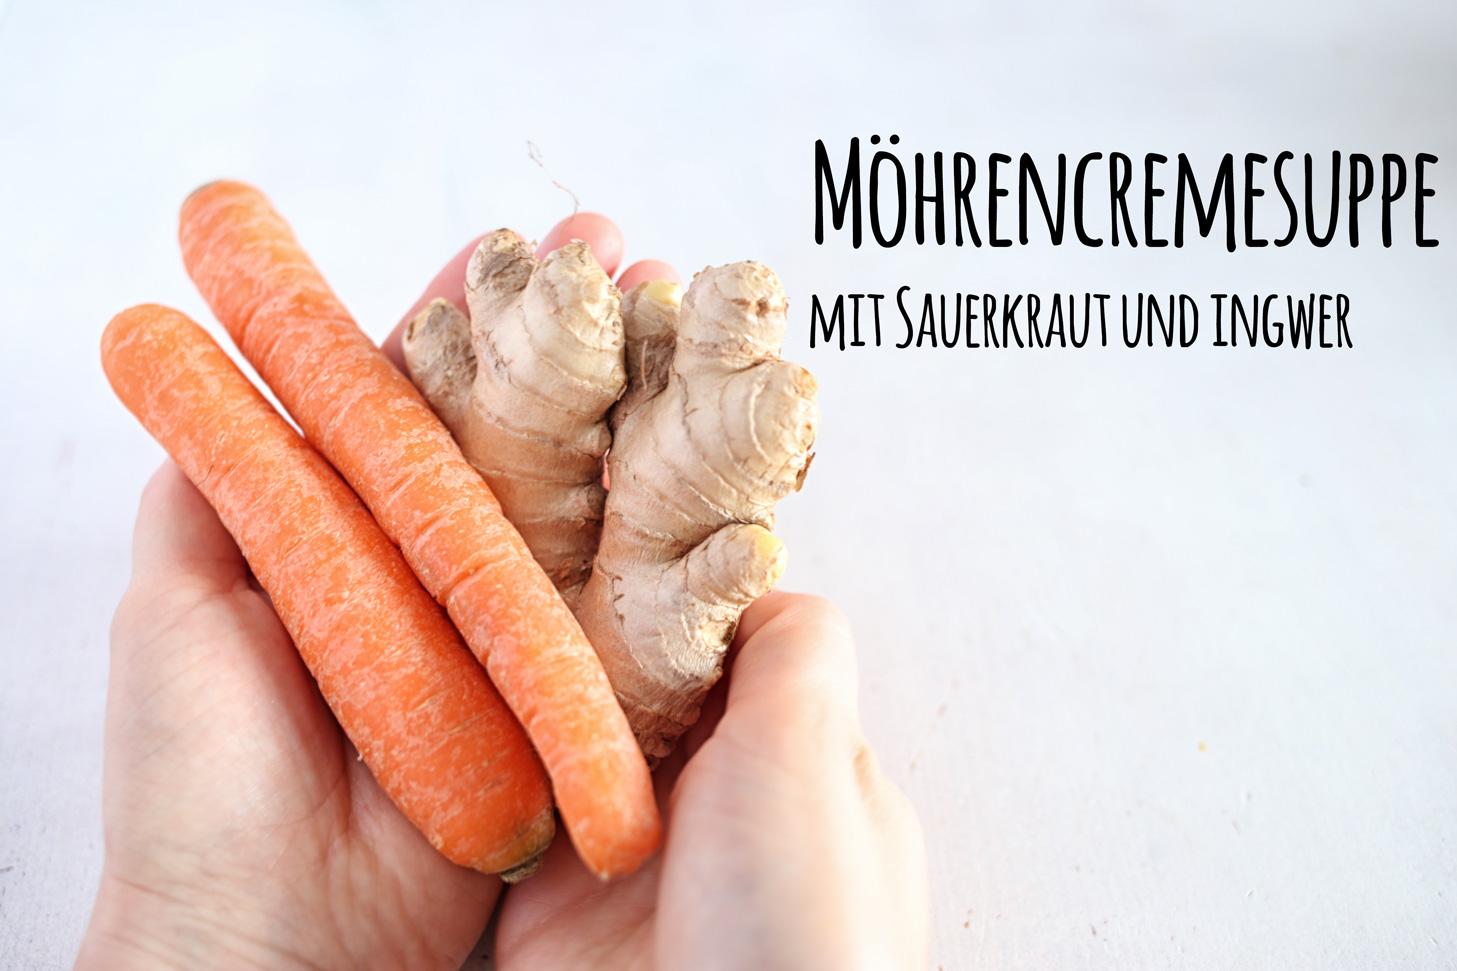 Moehrencremesuppe